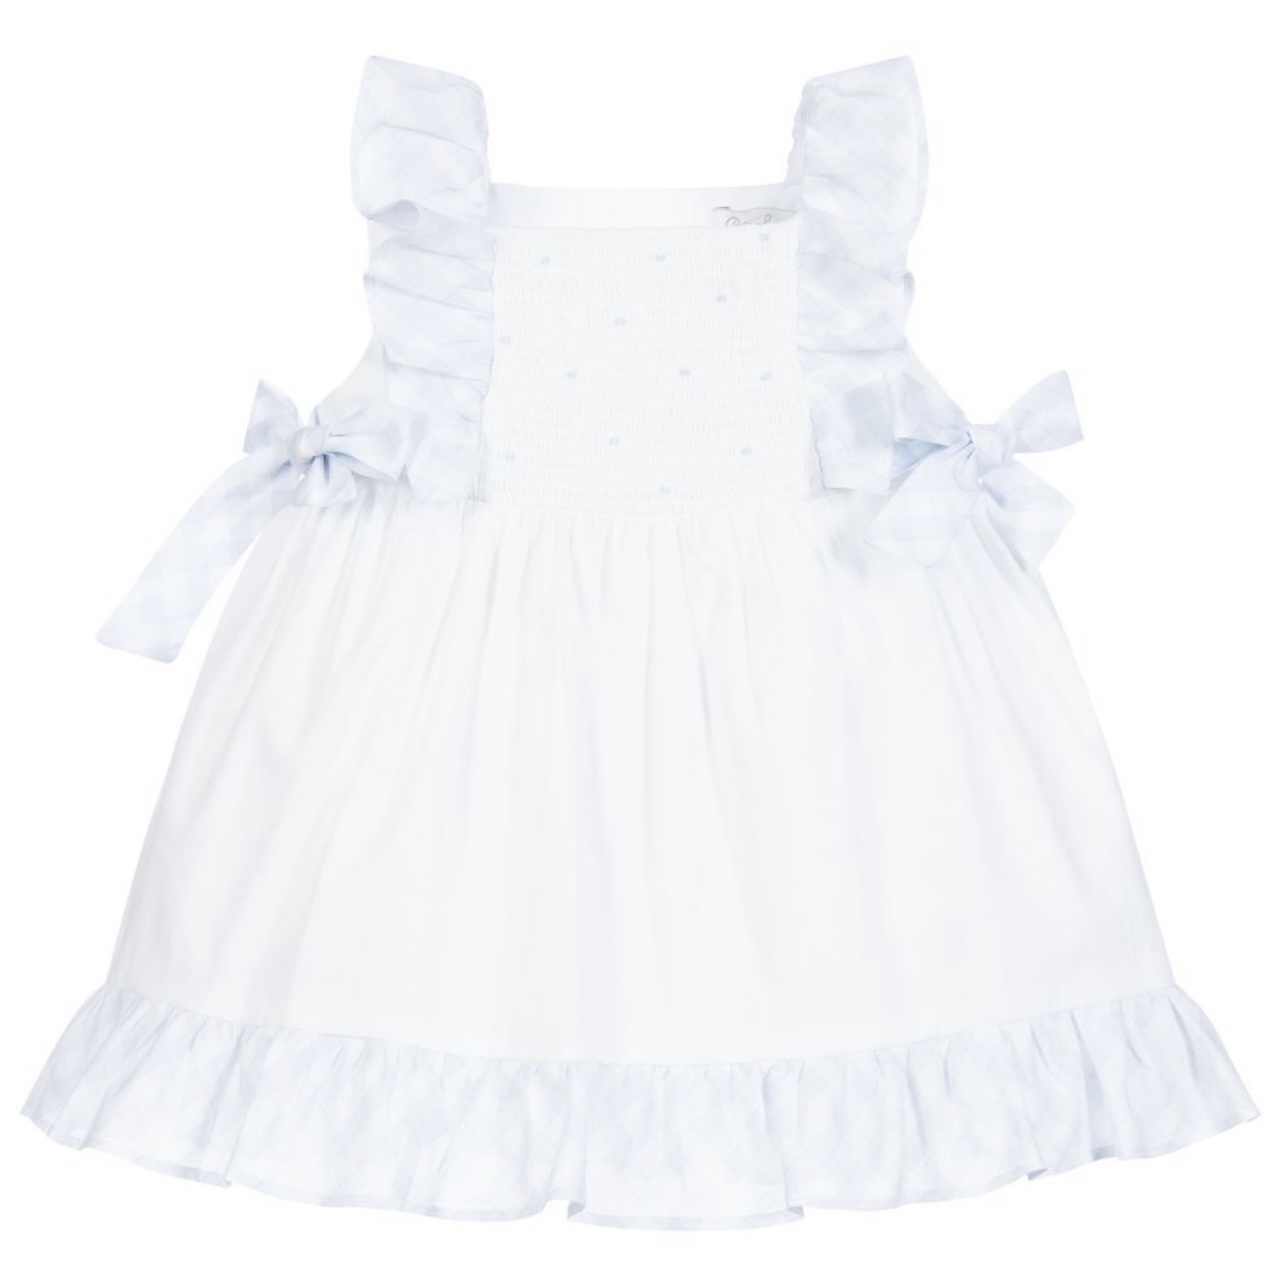 Patachou Patachou White & Blue Smocked Dress